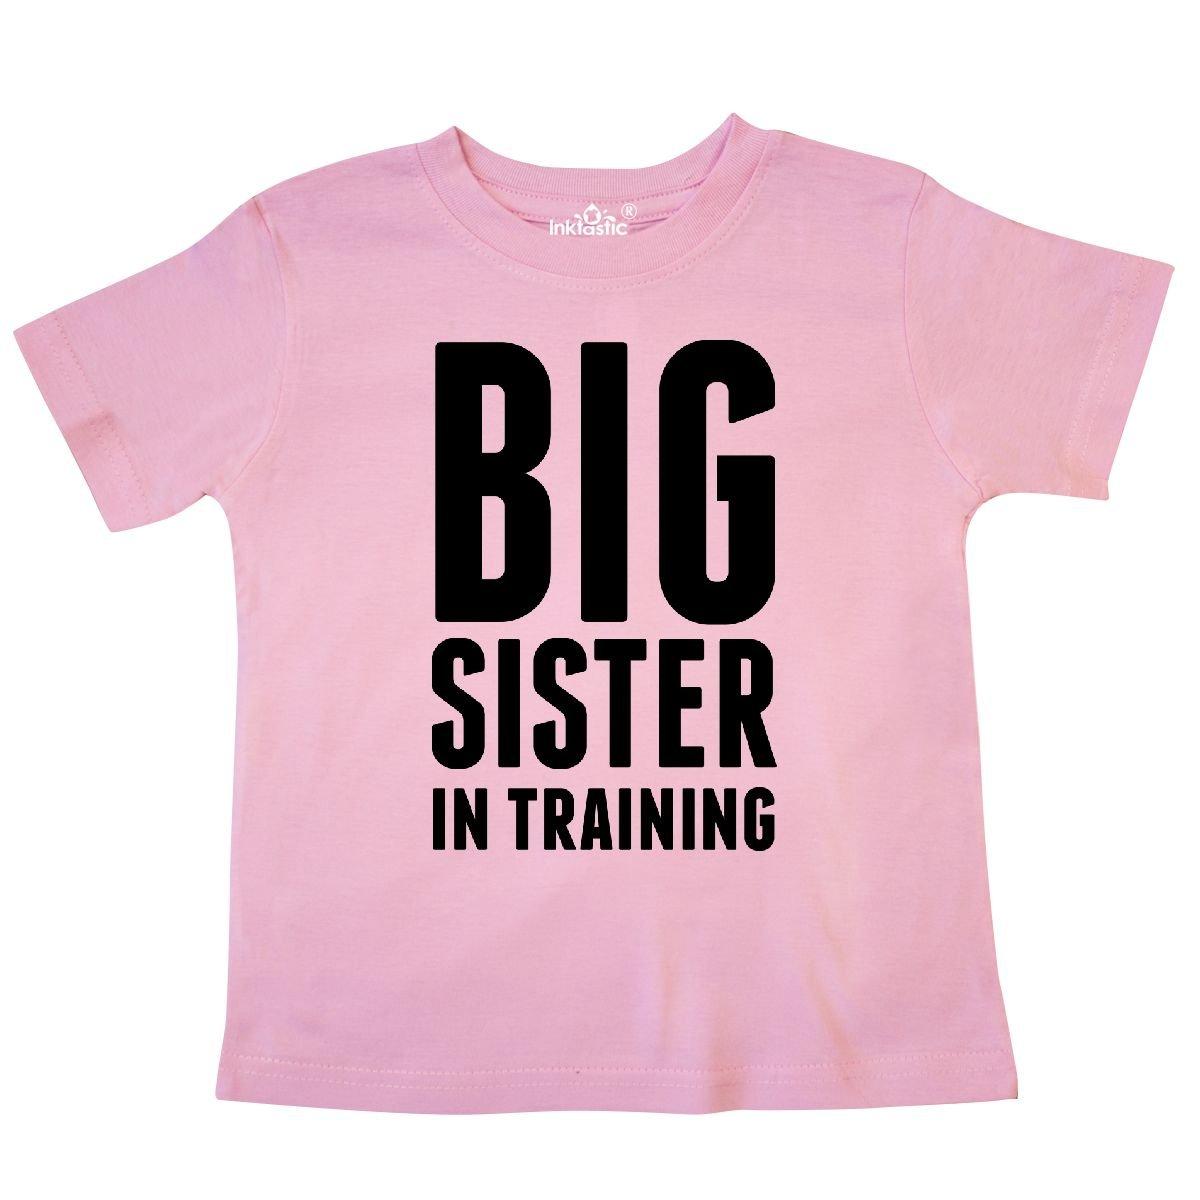 Older Sister in Training Toddler T-Shirt 276b1 inktastic